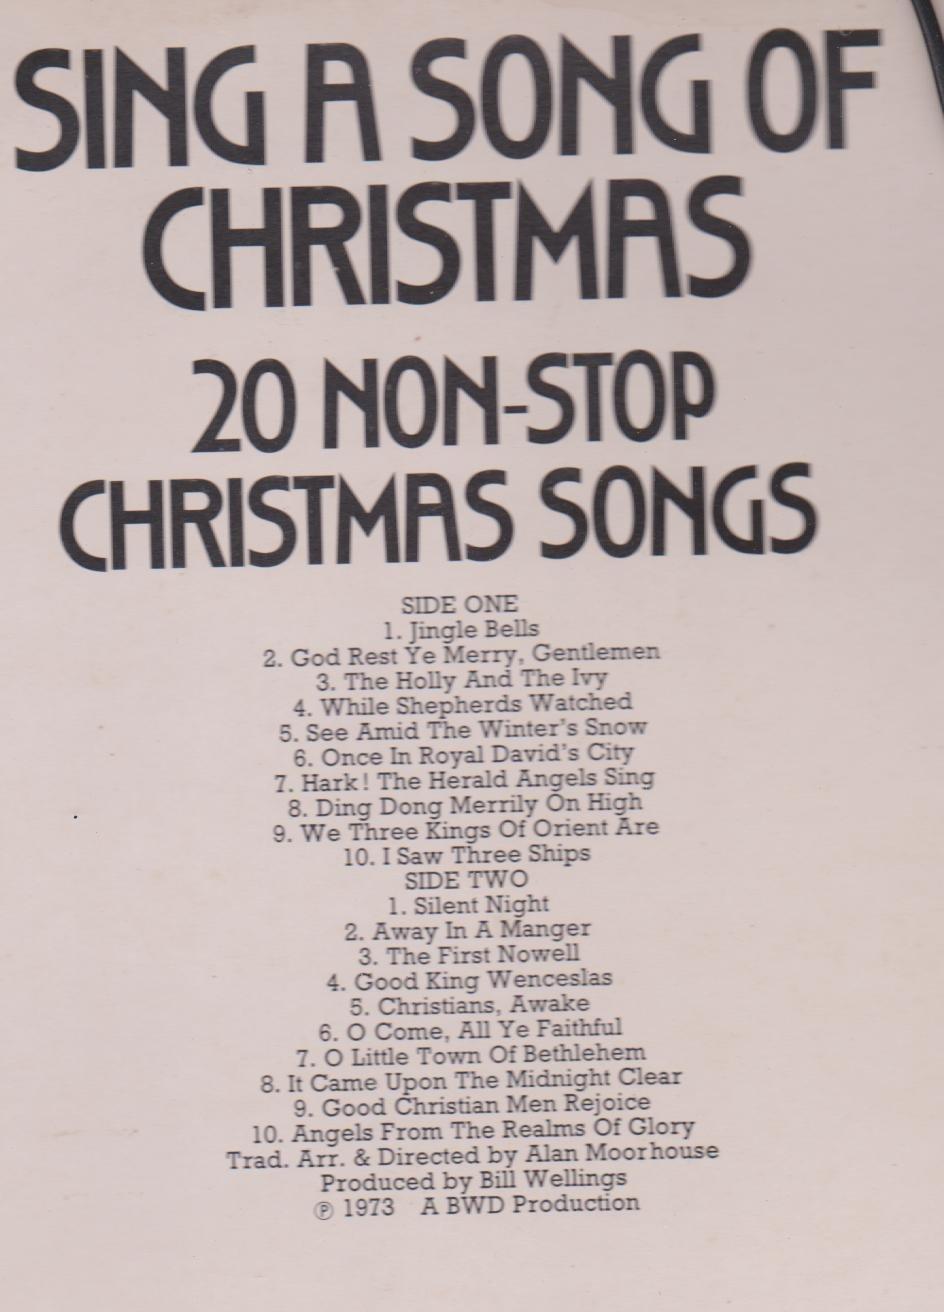 20 greatest christmas songs (1986) [Vinyl LP] - Boney M.: Amazon.de ...